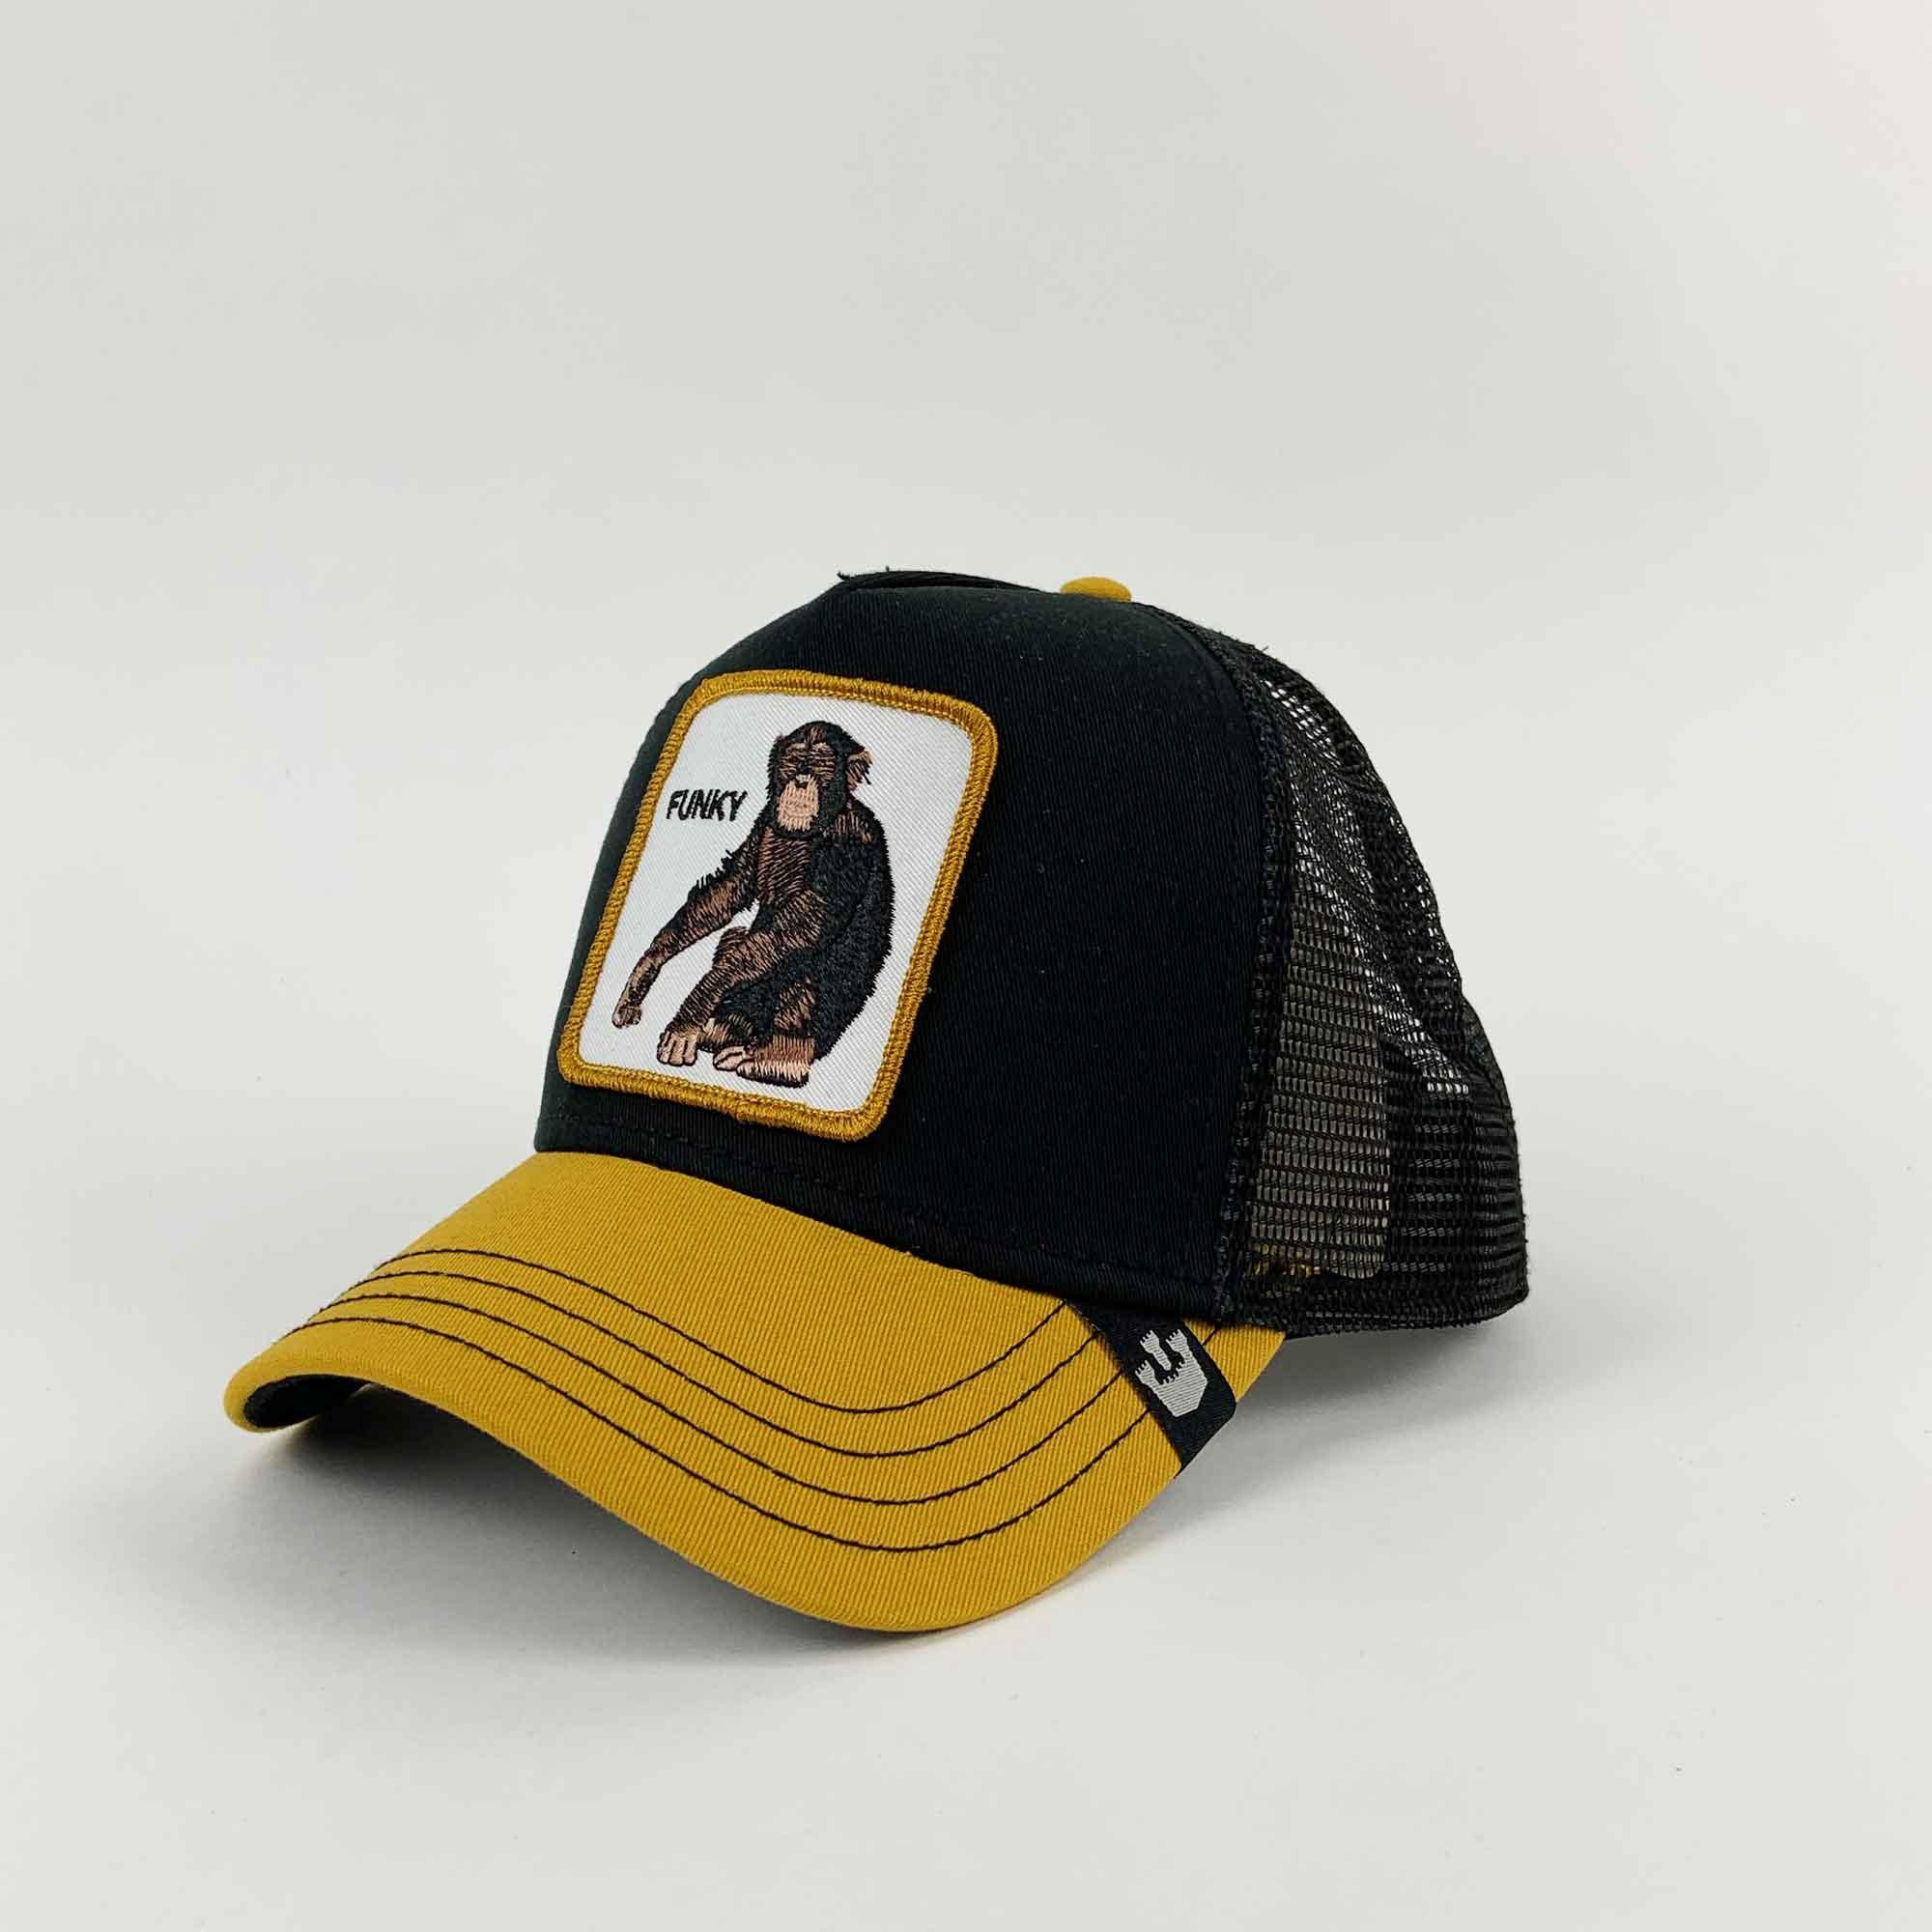 Cappello baseball funky - Nero